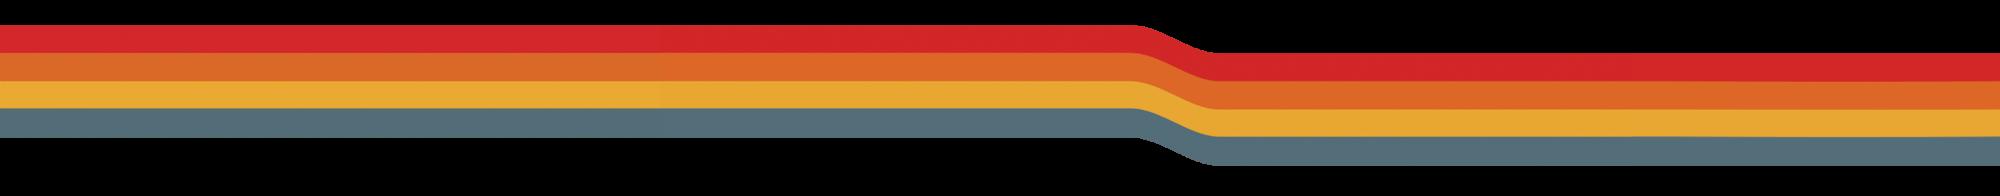 LargeVandoit-Stripe